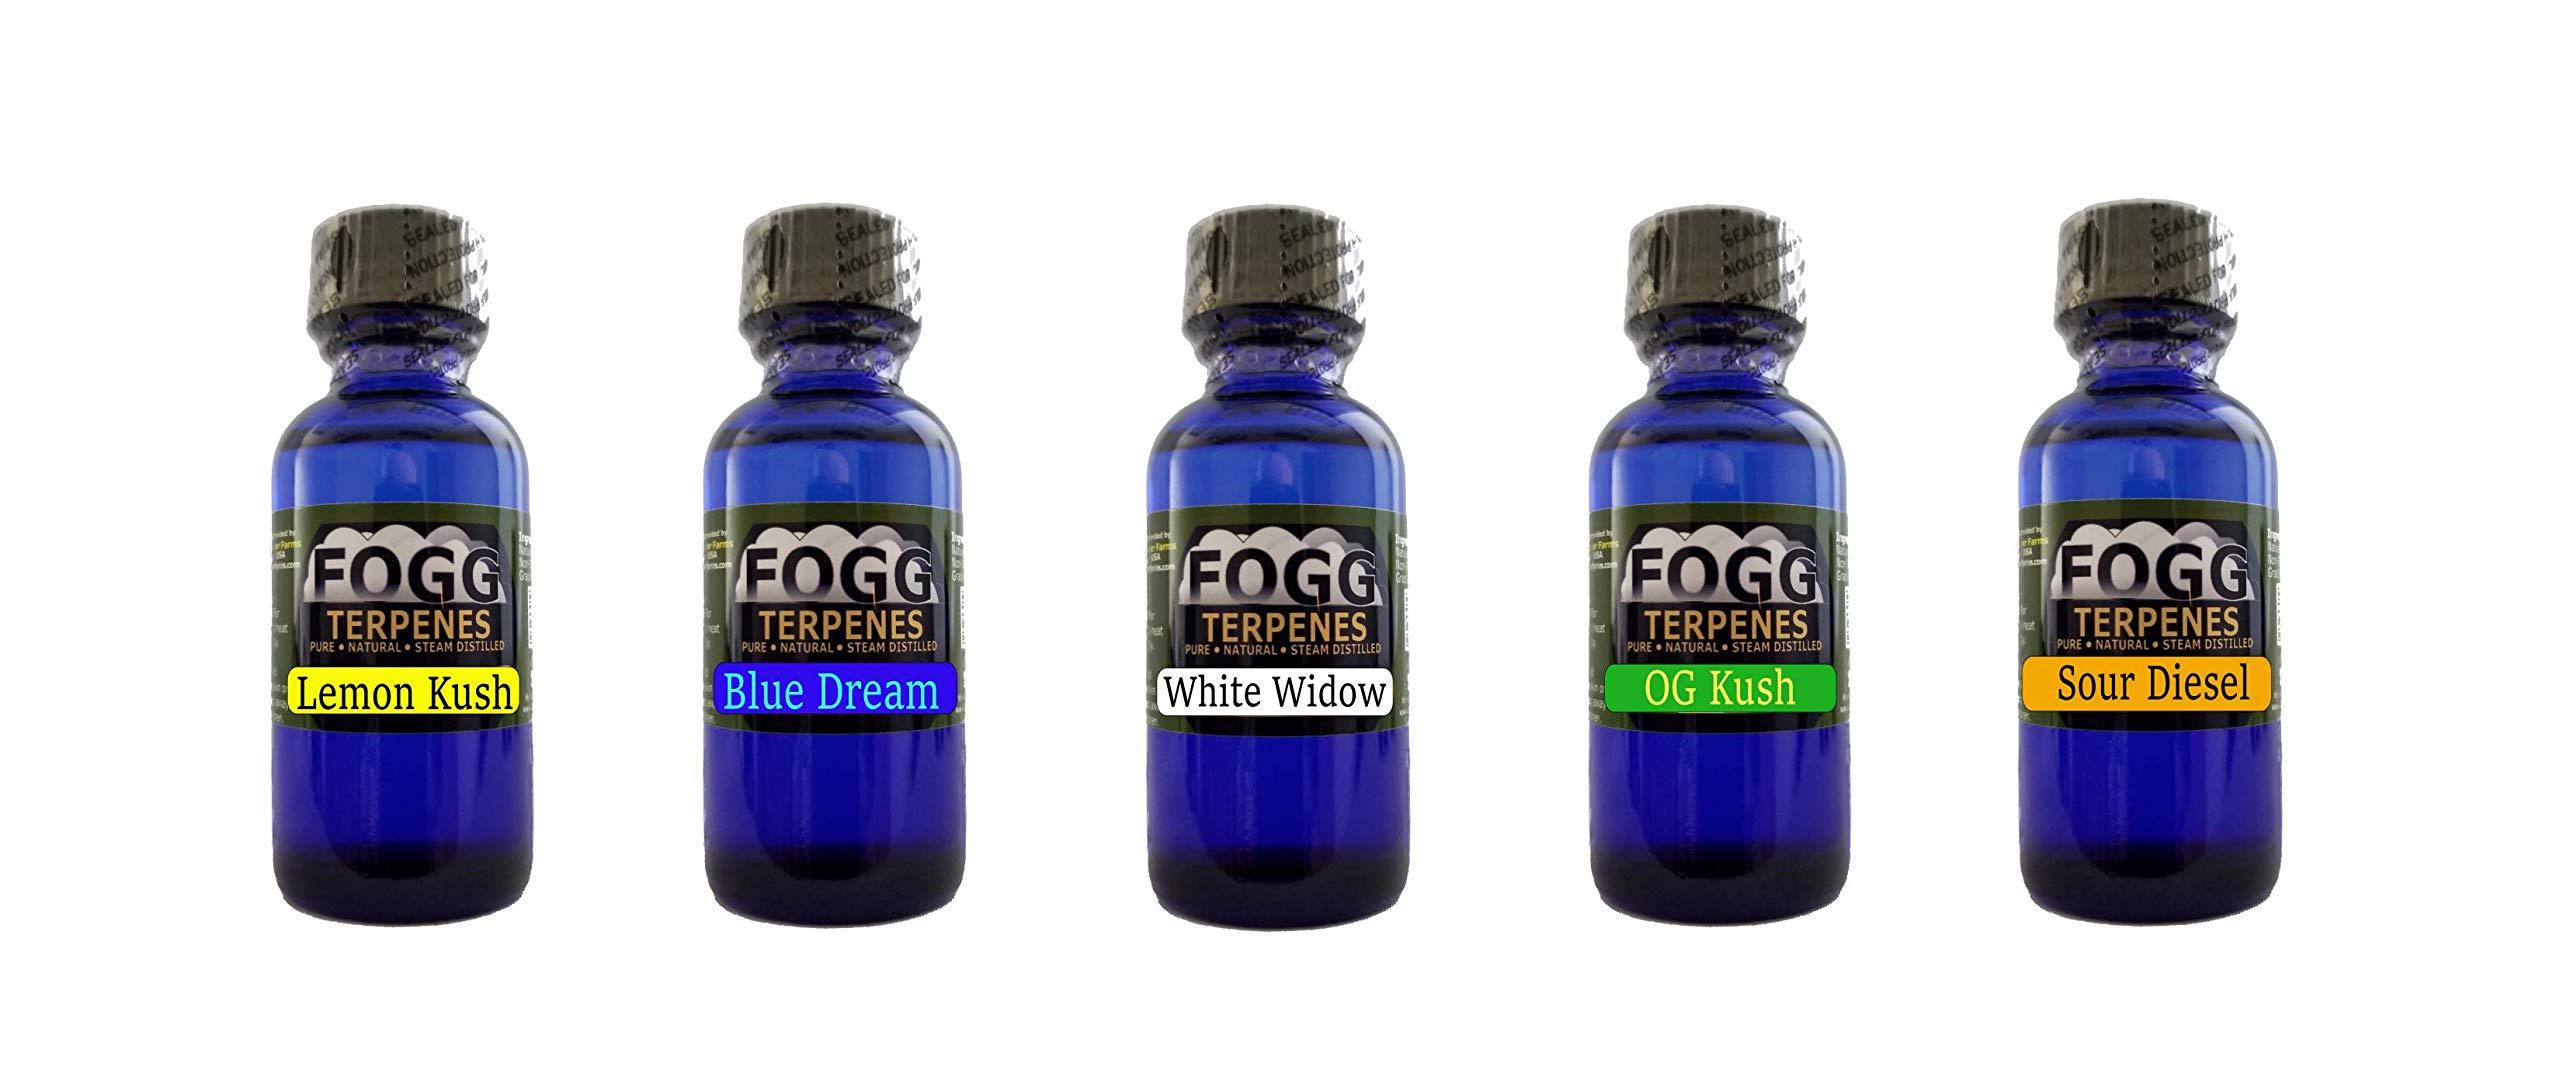 FOGG Terpenes - Bestsellers Collection (30 ml)